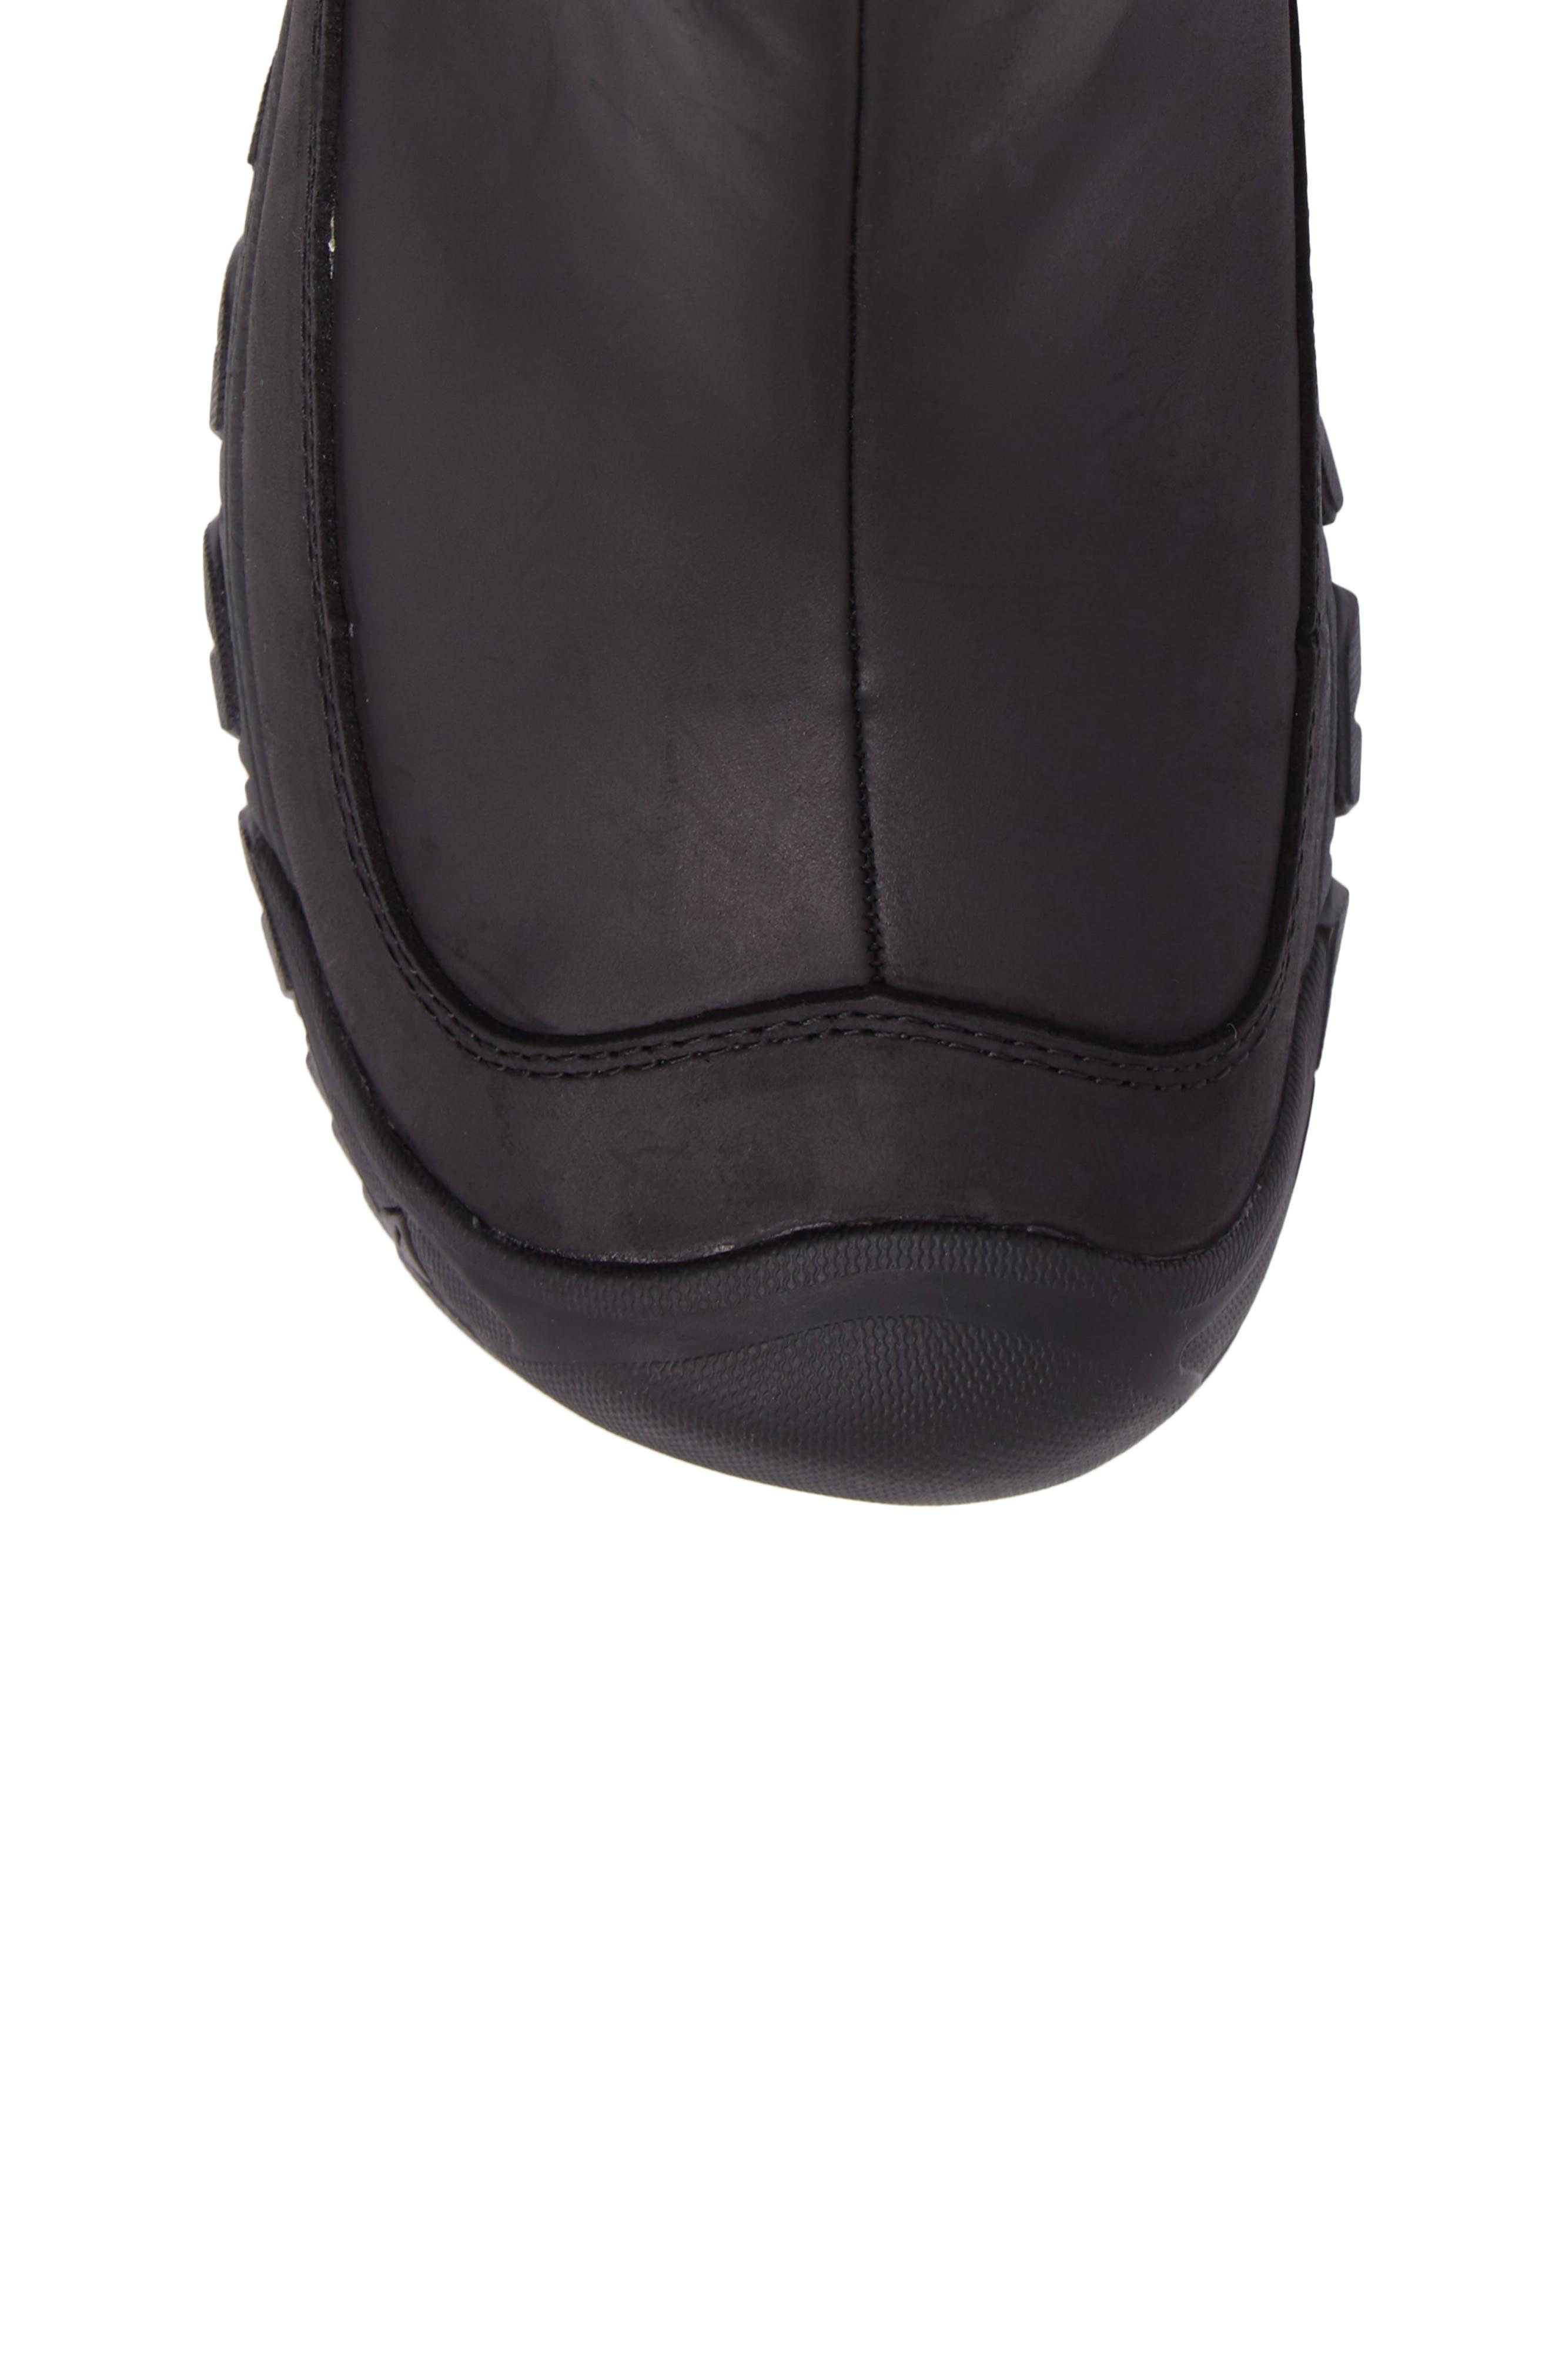 KEEN, Anchorage II Waterproof Chelsea Boot, Alternate thumbnail 5, color, 001